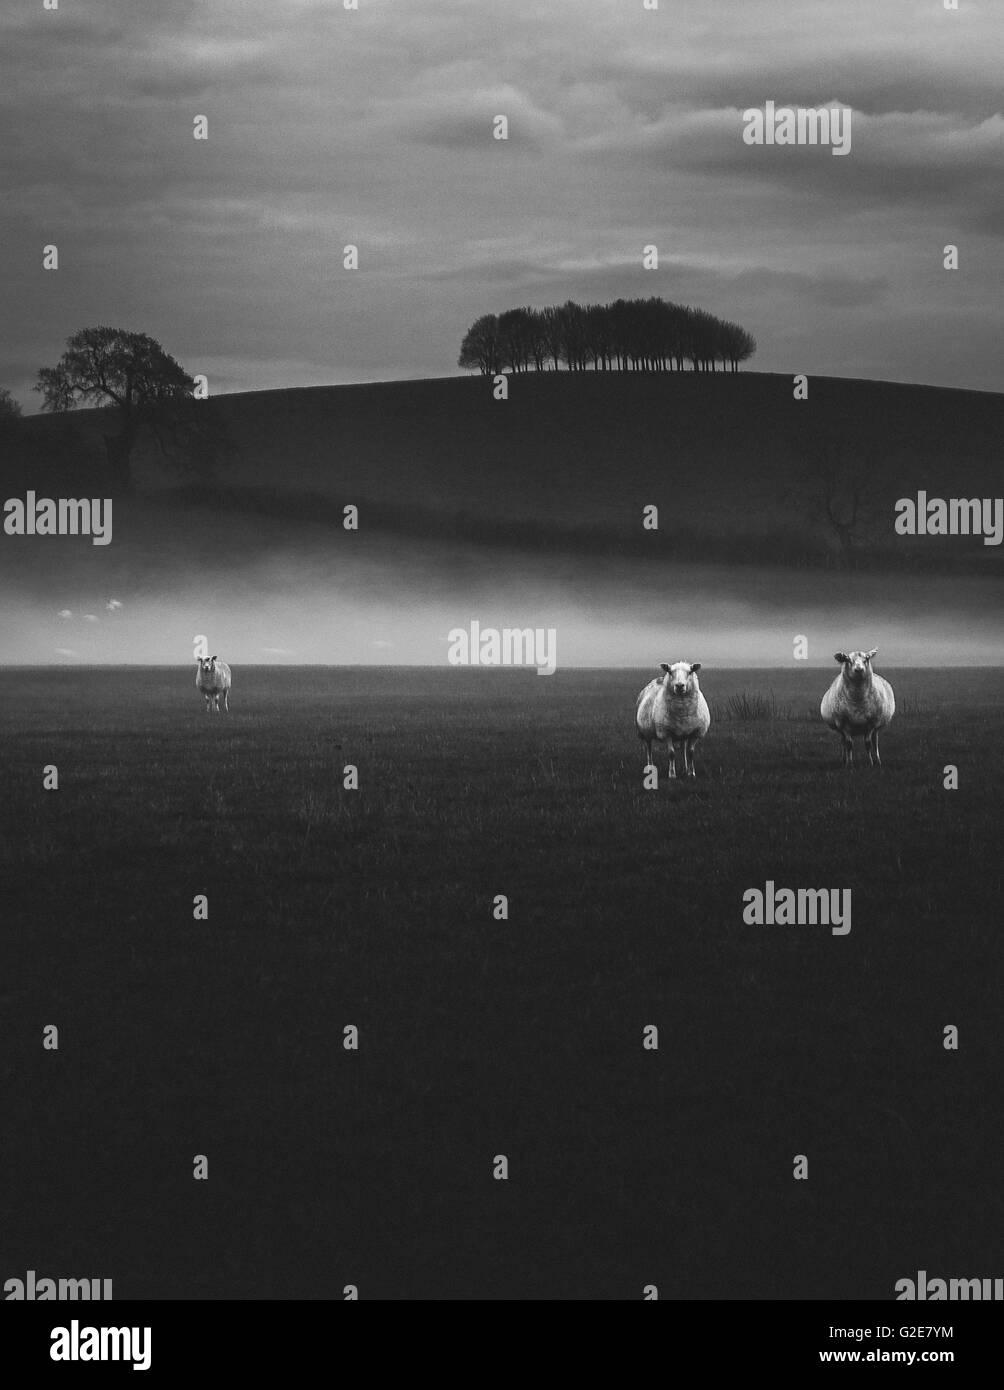 Three Sheep in Foggy Field, Gloucestershire, England, UK - Stock Image